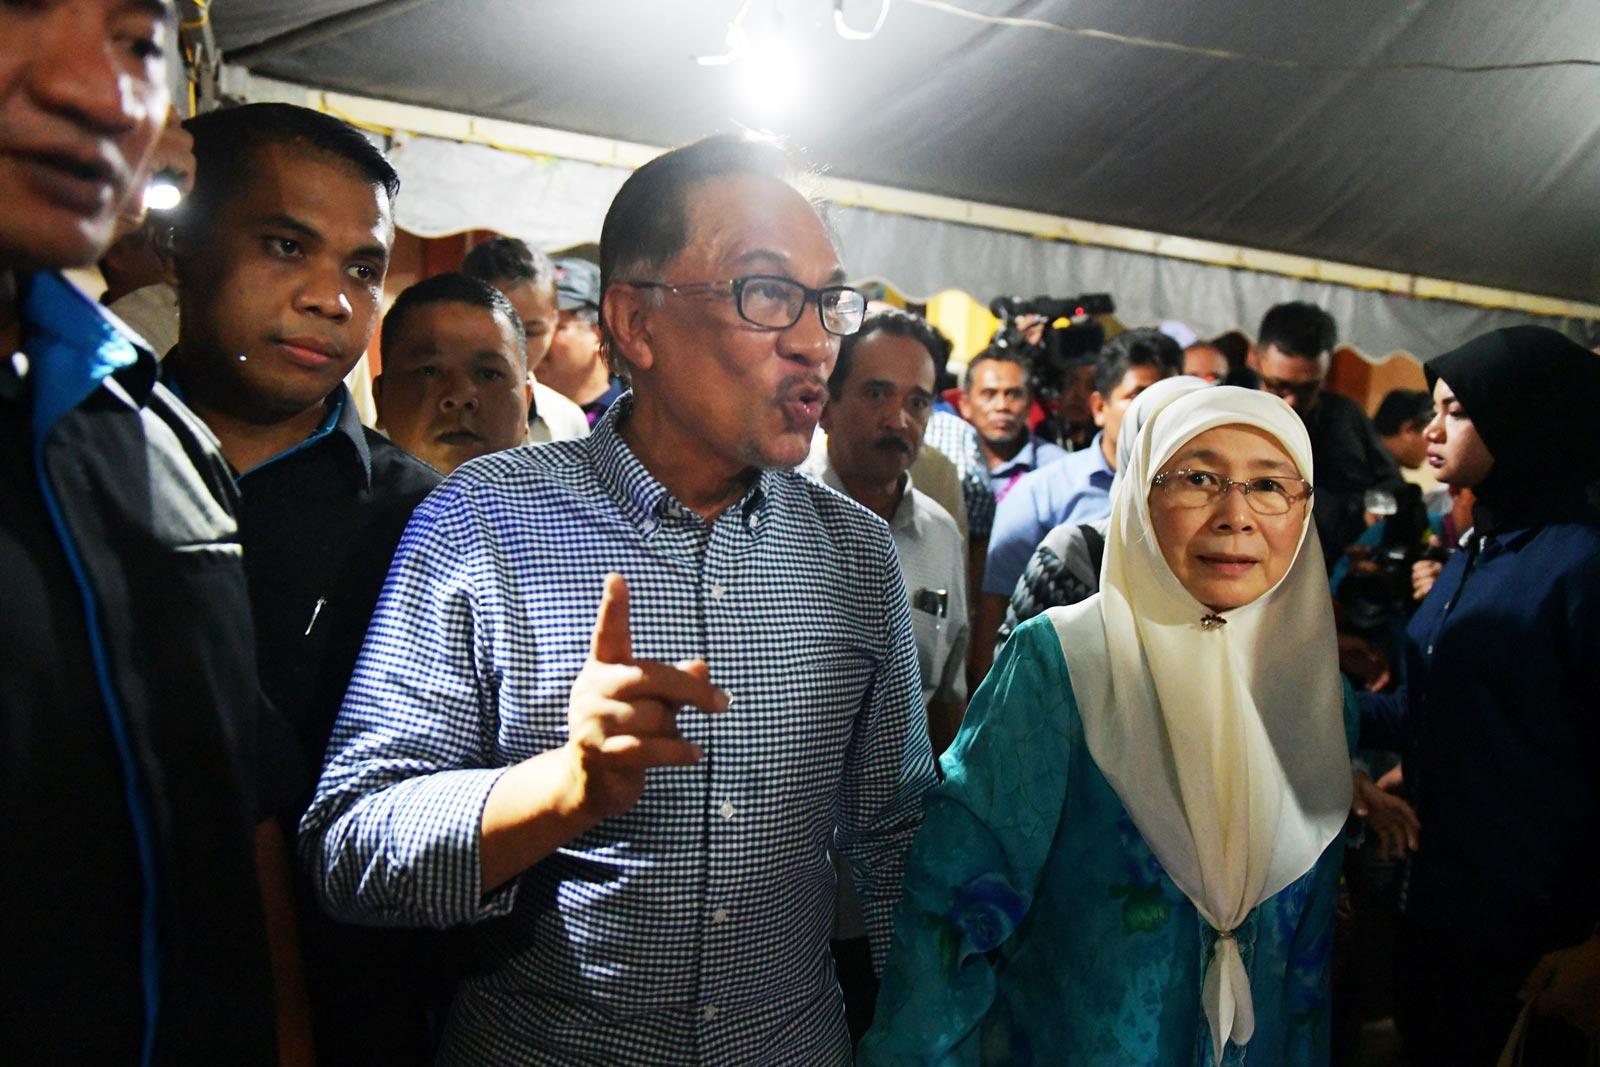 Anwar Ibrahim with his wife Wan Azizah Wan Ismail.